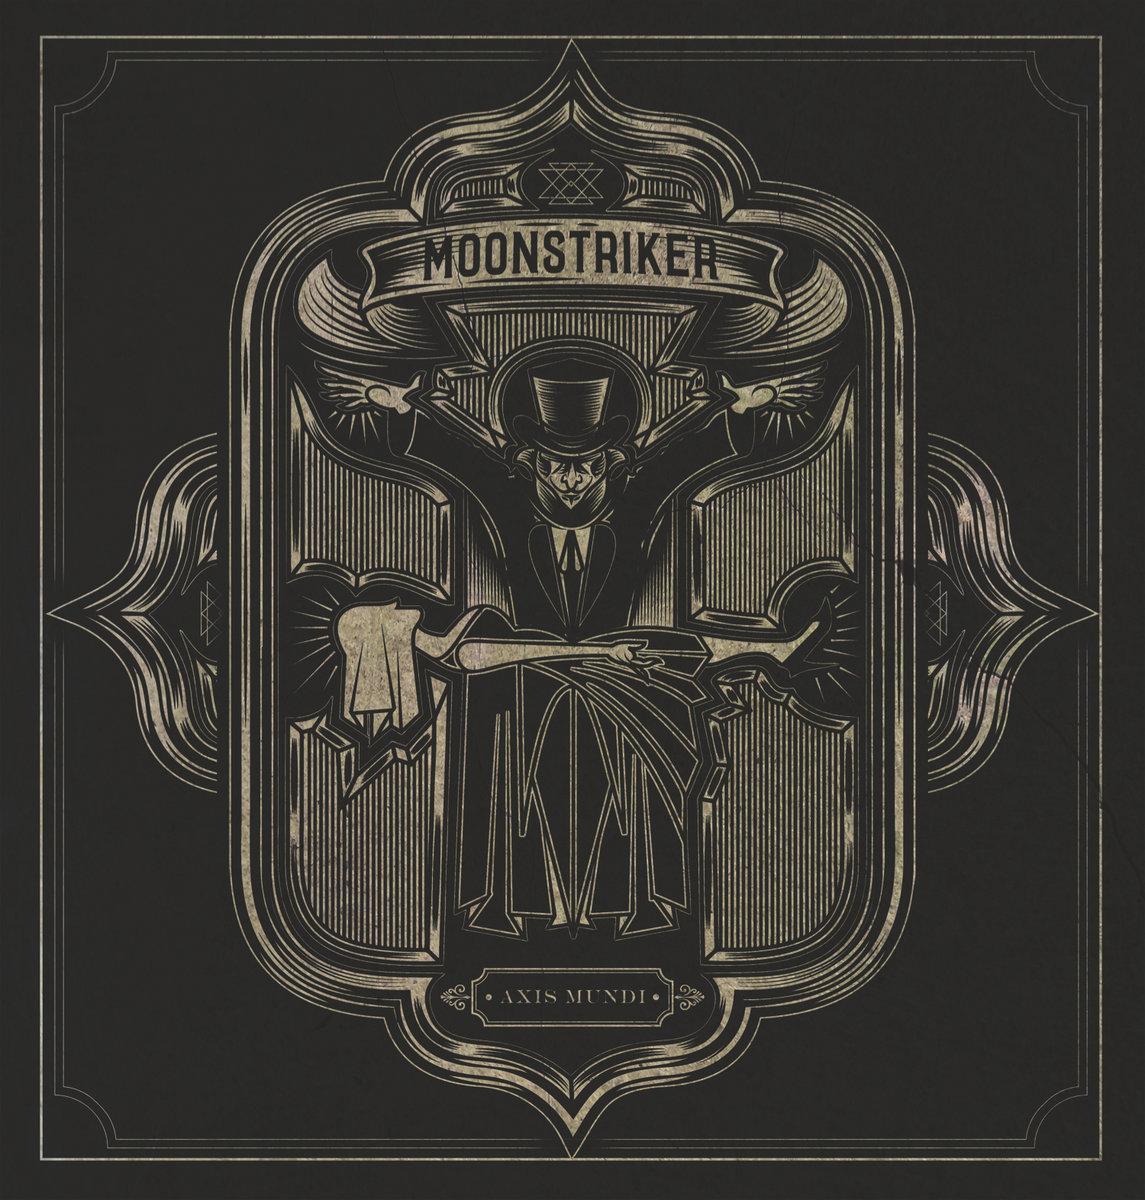 Axis Mundi axis mundi moonstriker